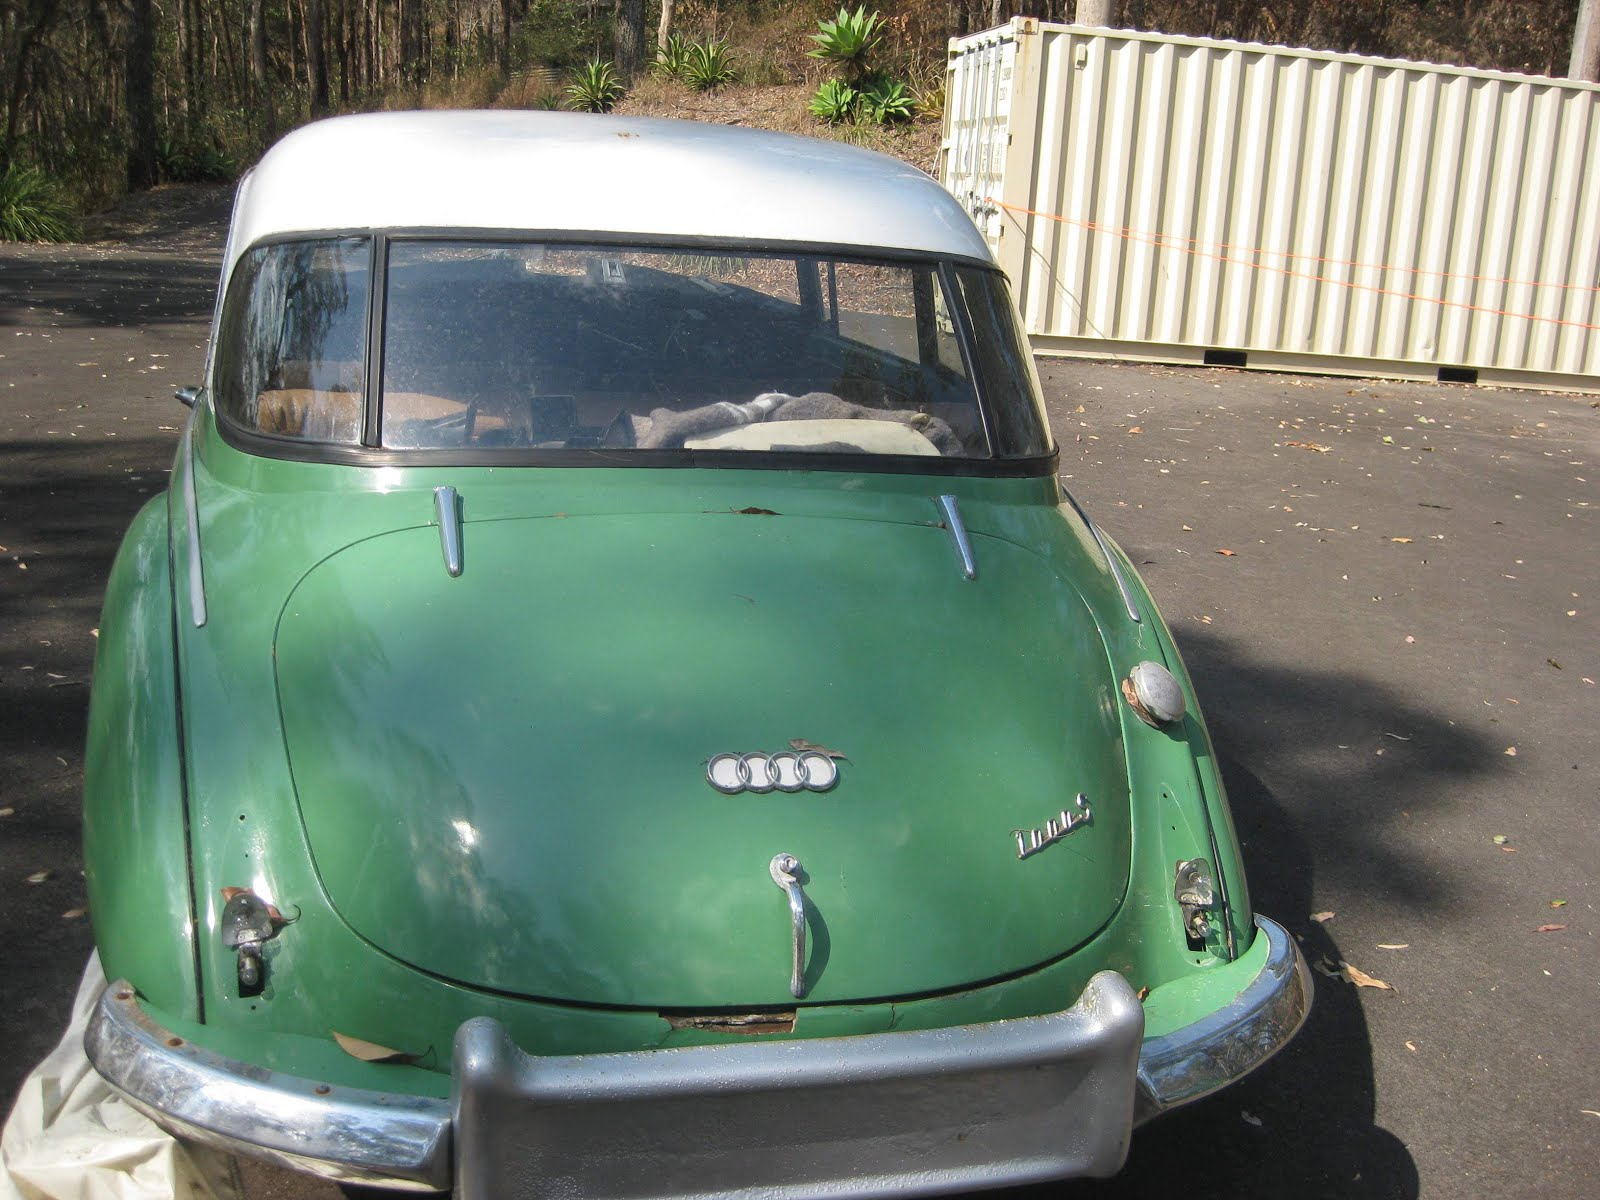 Auto-Union Project: Surviving DKW Cars In Australia